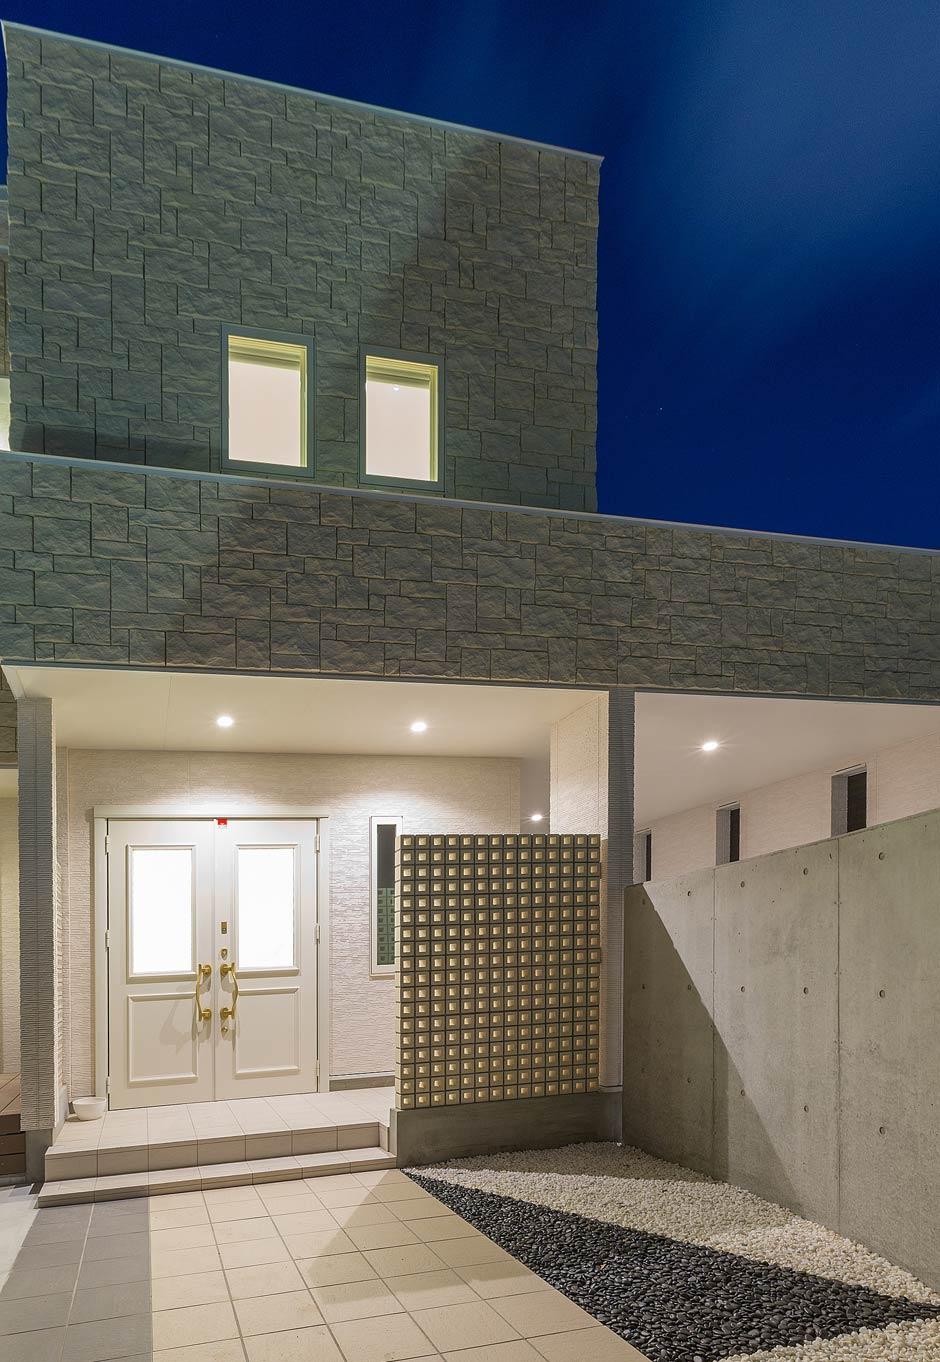 i.u.建築企画【デザイン住宅、建築家、インテリア】ファサードには白い穴あきブロックの壁をモニュメントとして設置。地面は白黒の玉砂利を敷き分けデザイン